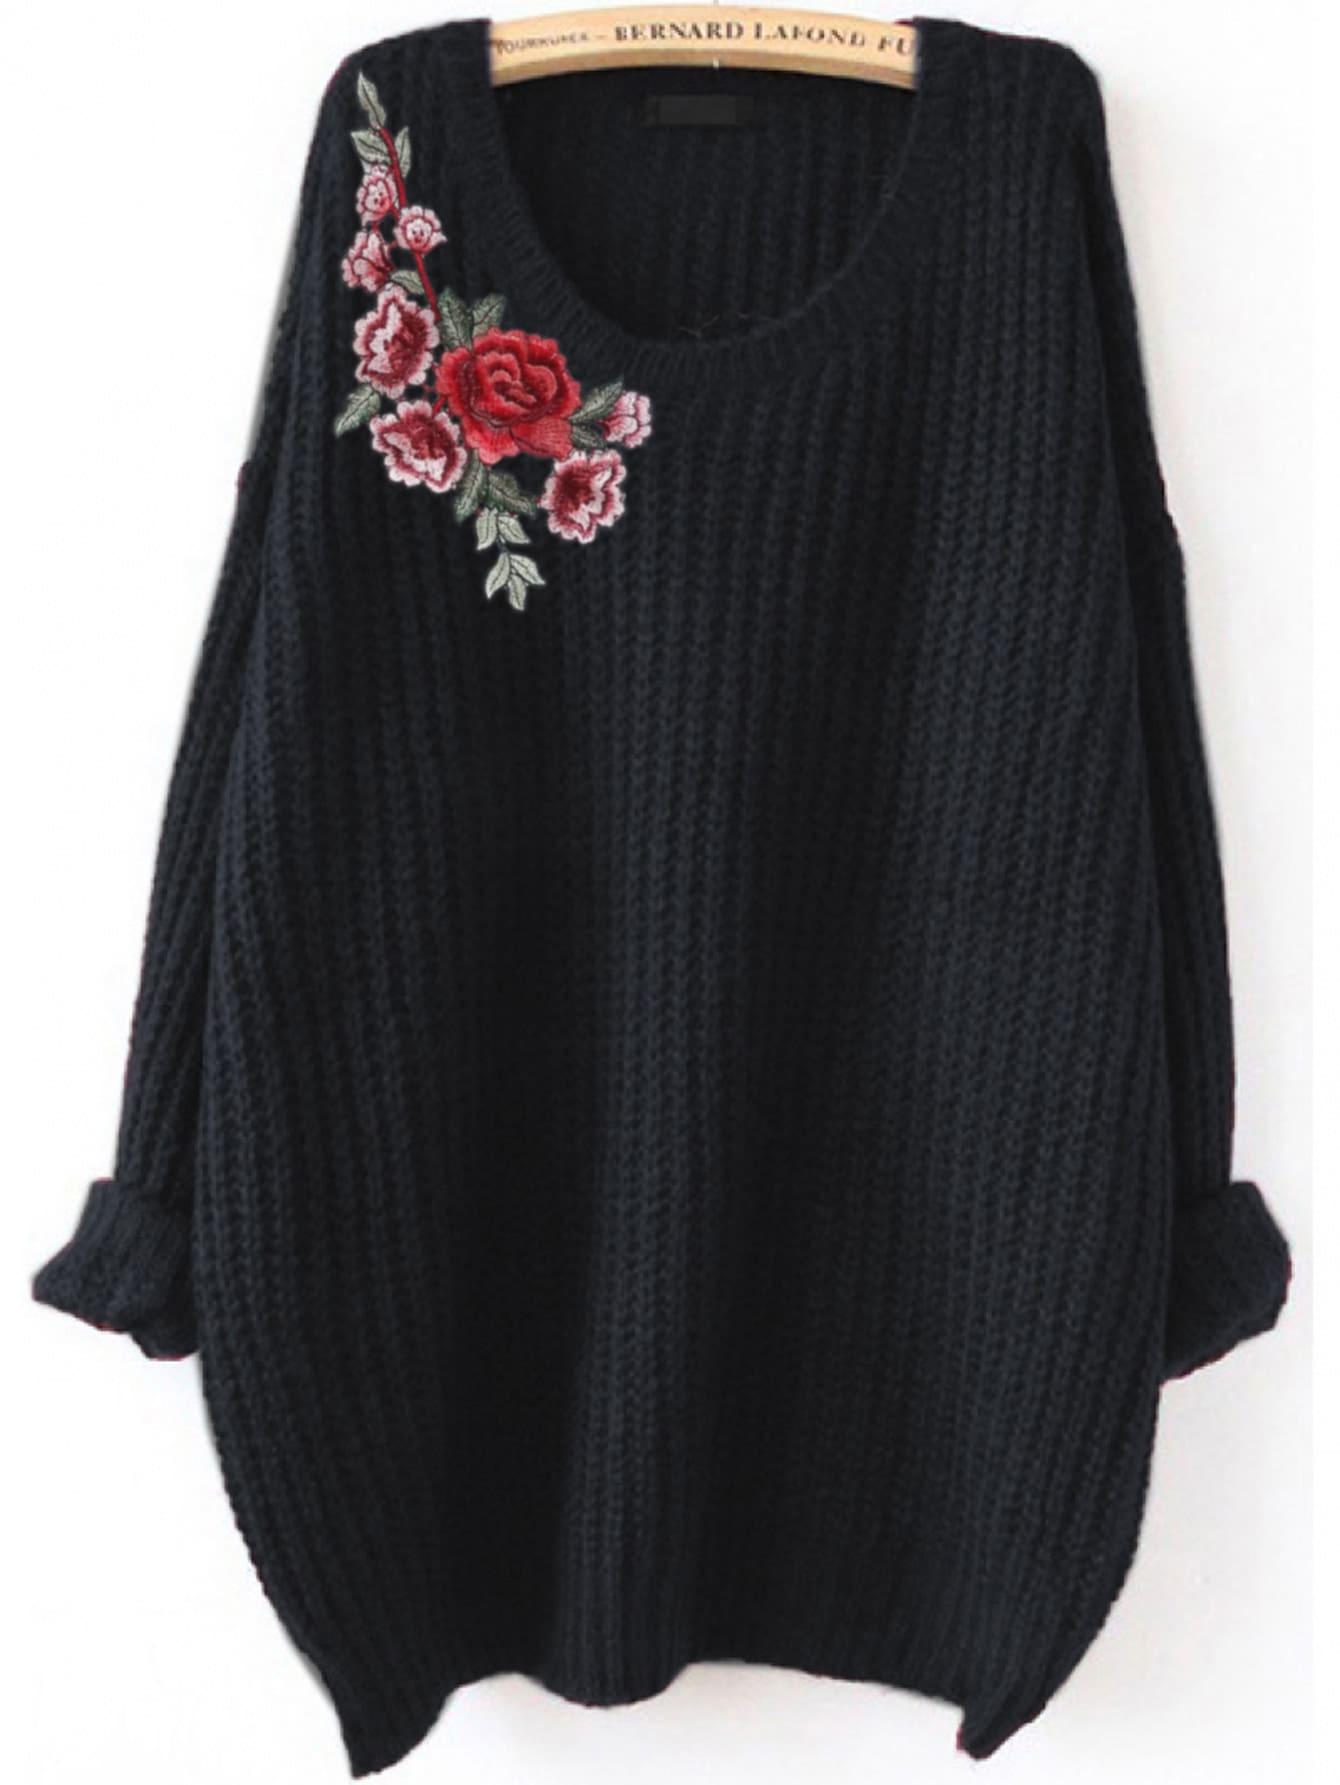 Embroidered Flower Patch Jumper girls spot embroidered sleeveless jumper